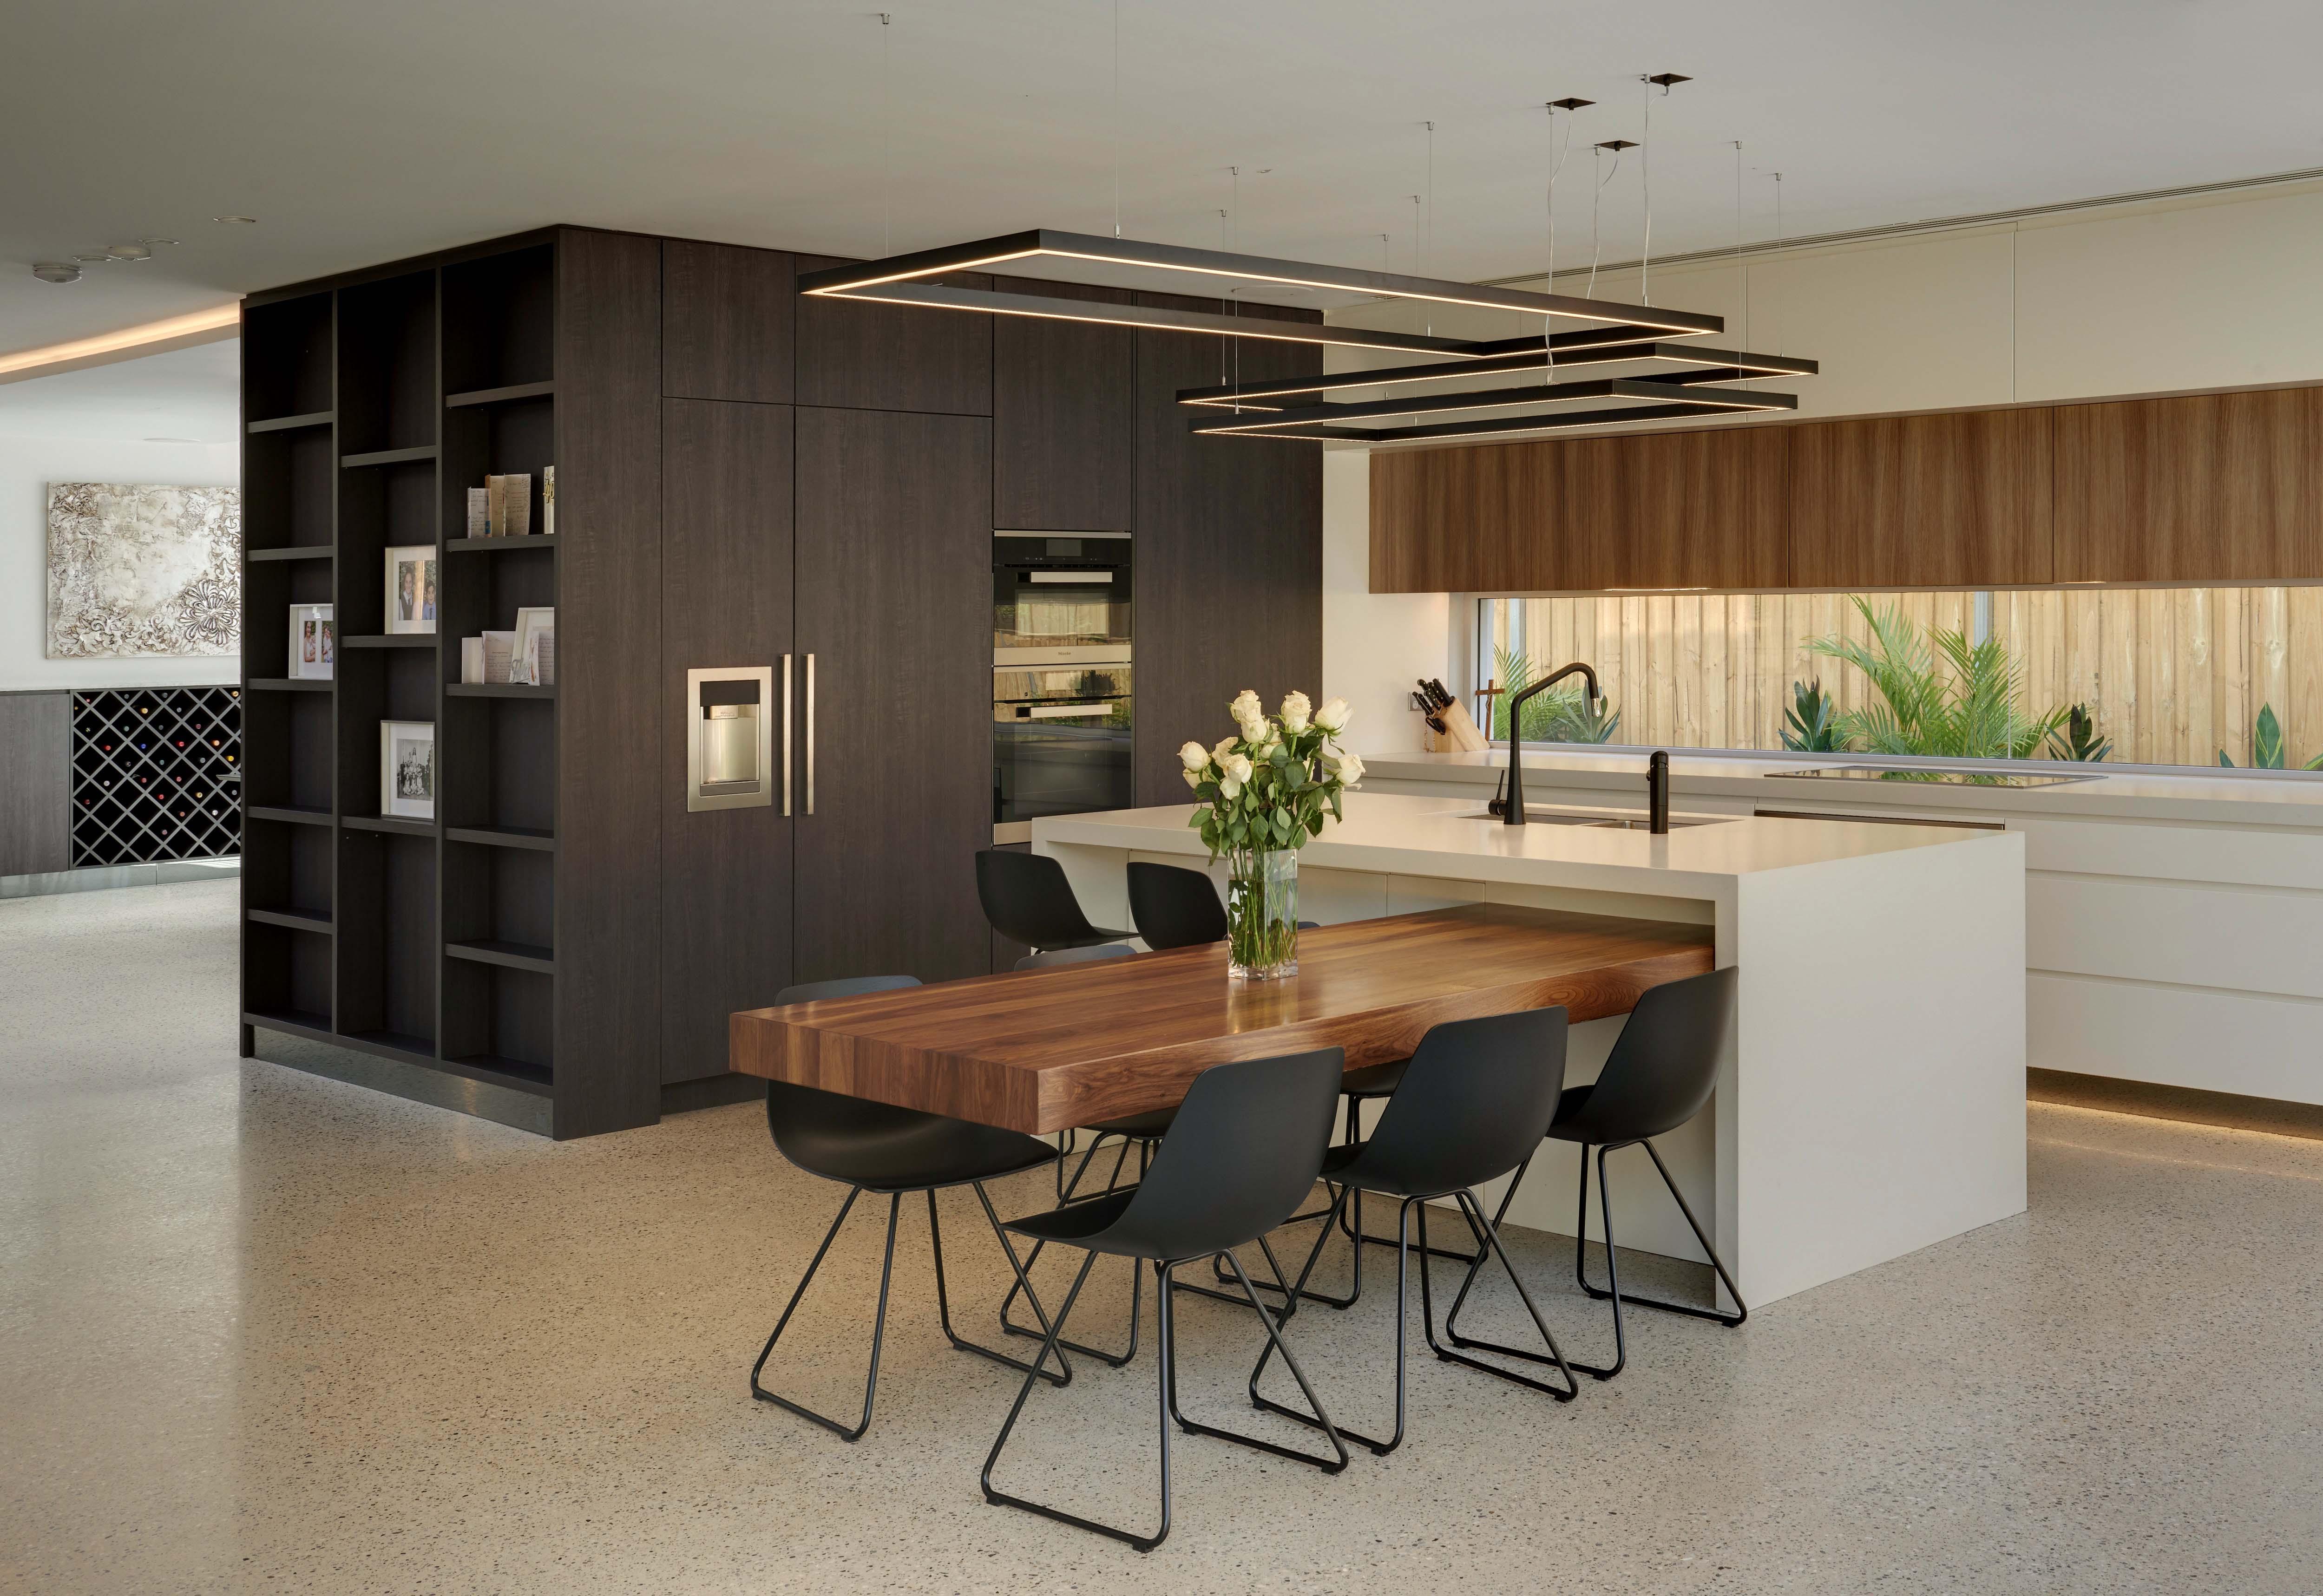 Strathfield residence kitchen studiojla - La residence kitchel par boora architects ...